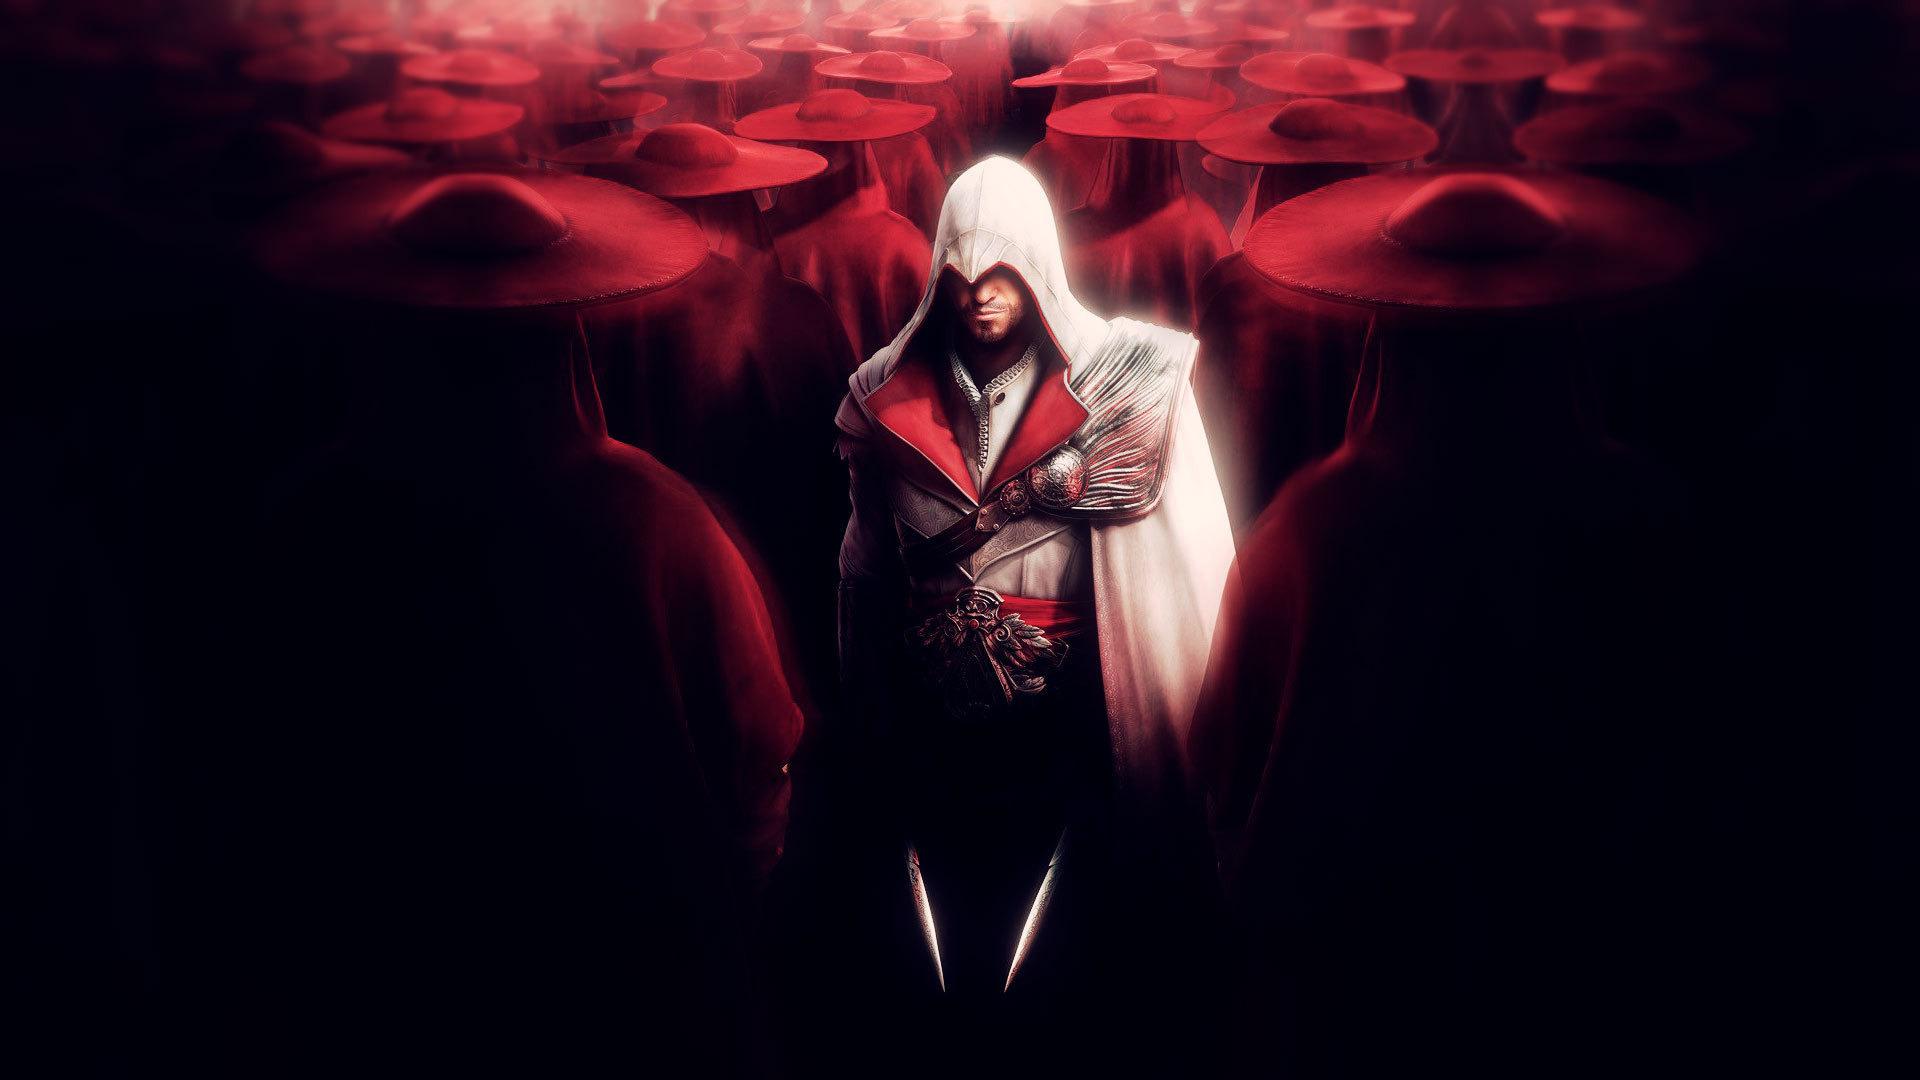 assassin's creed: brotherhood hd wallpaper | background image